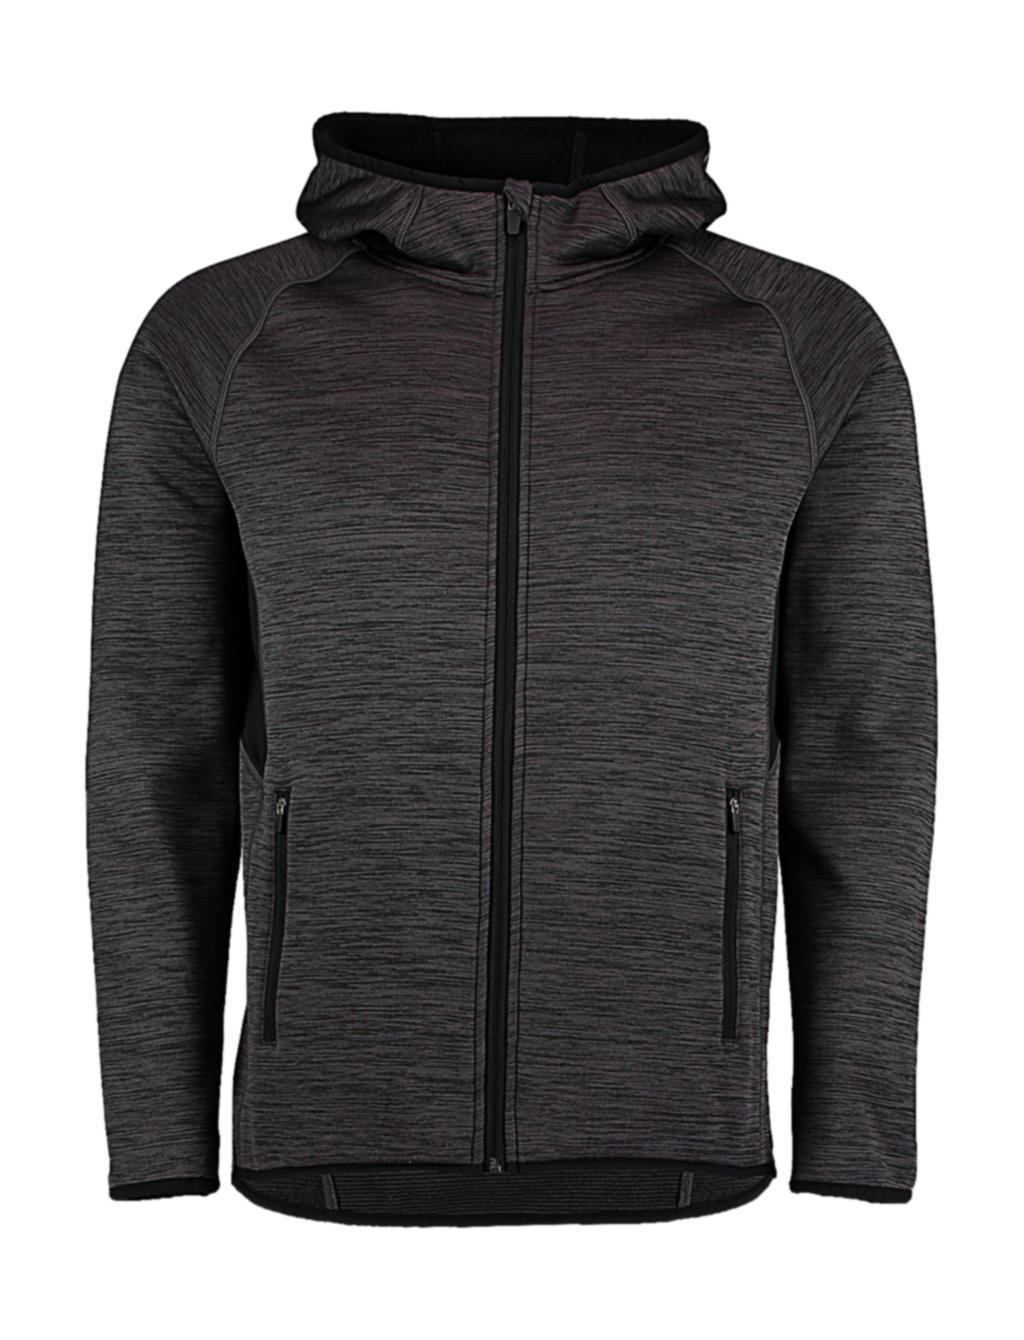 Gamegear® Sports Jacket